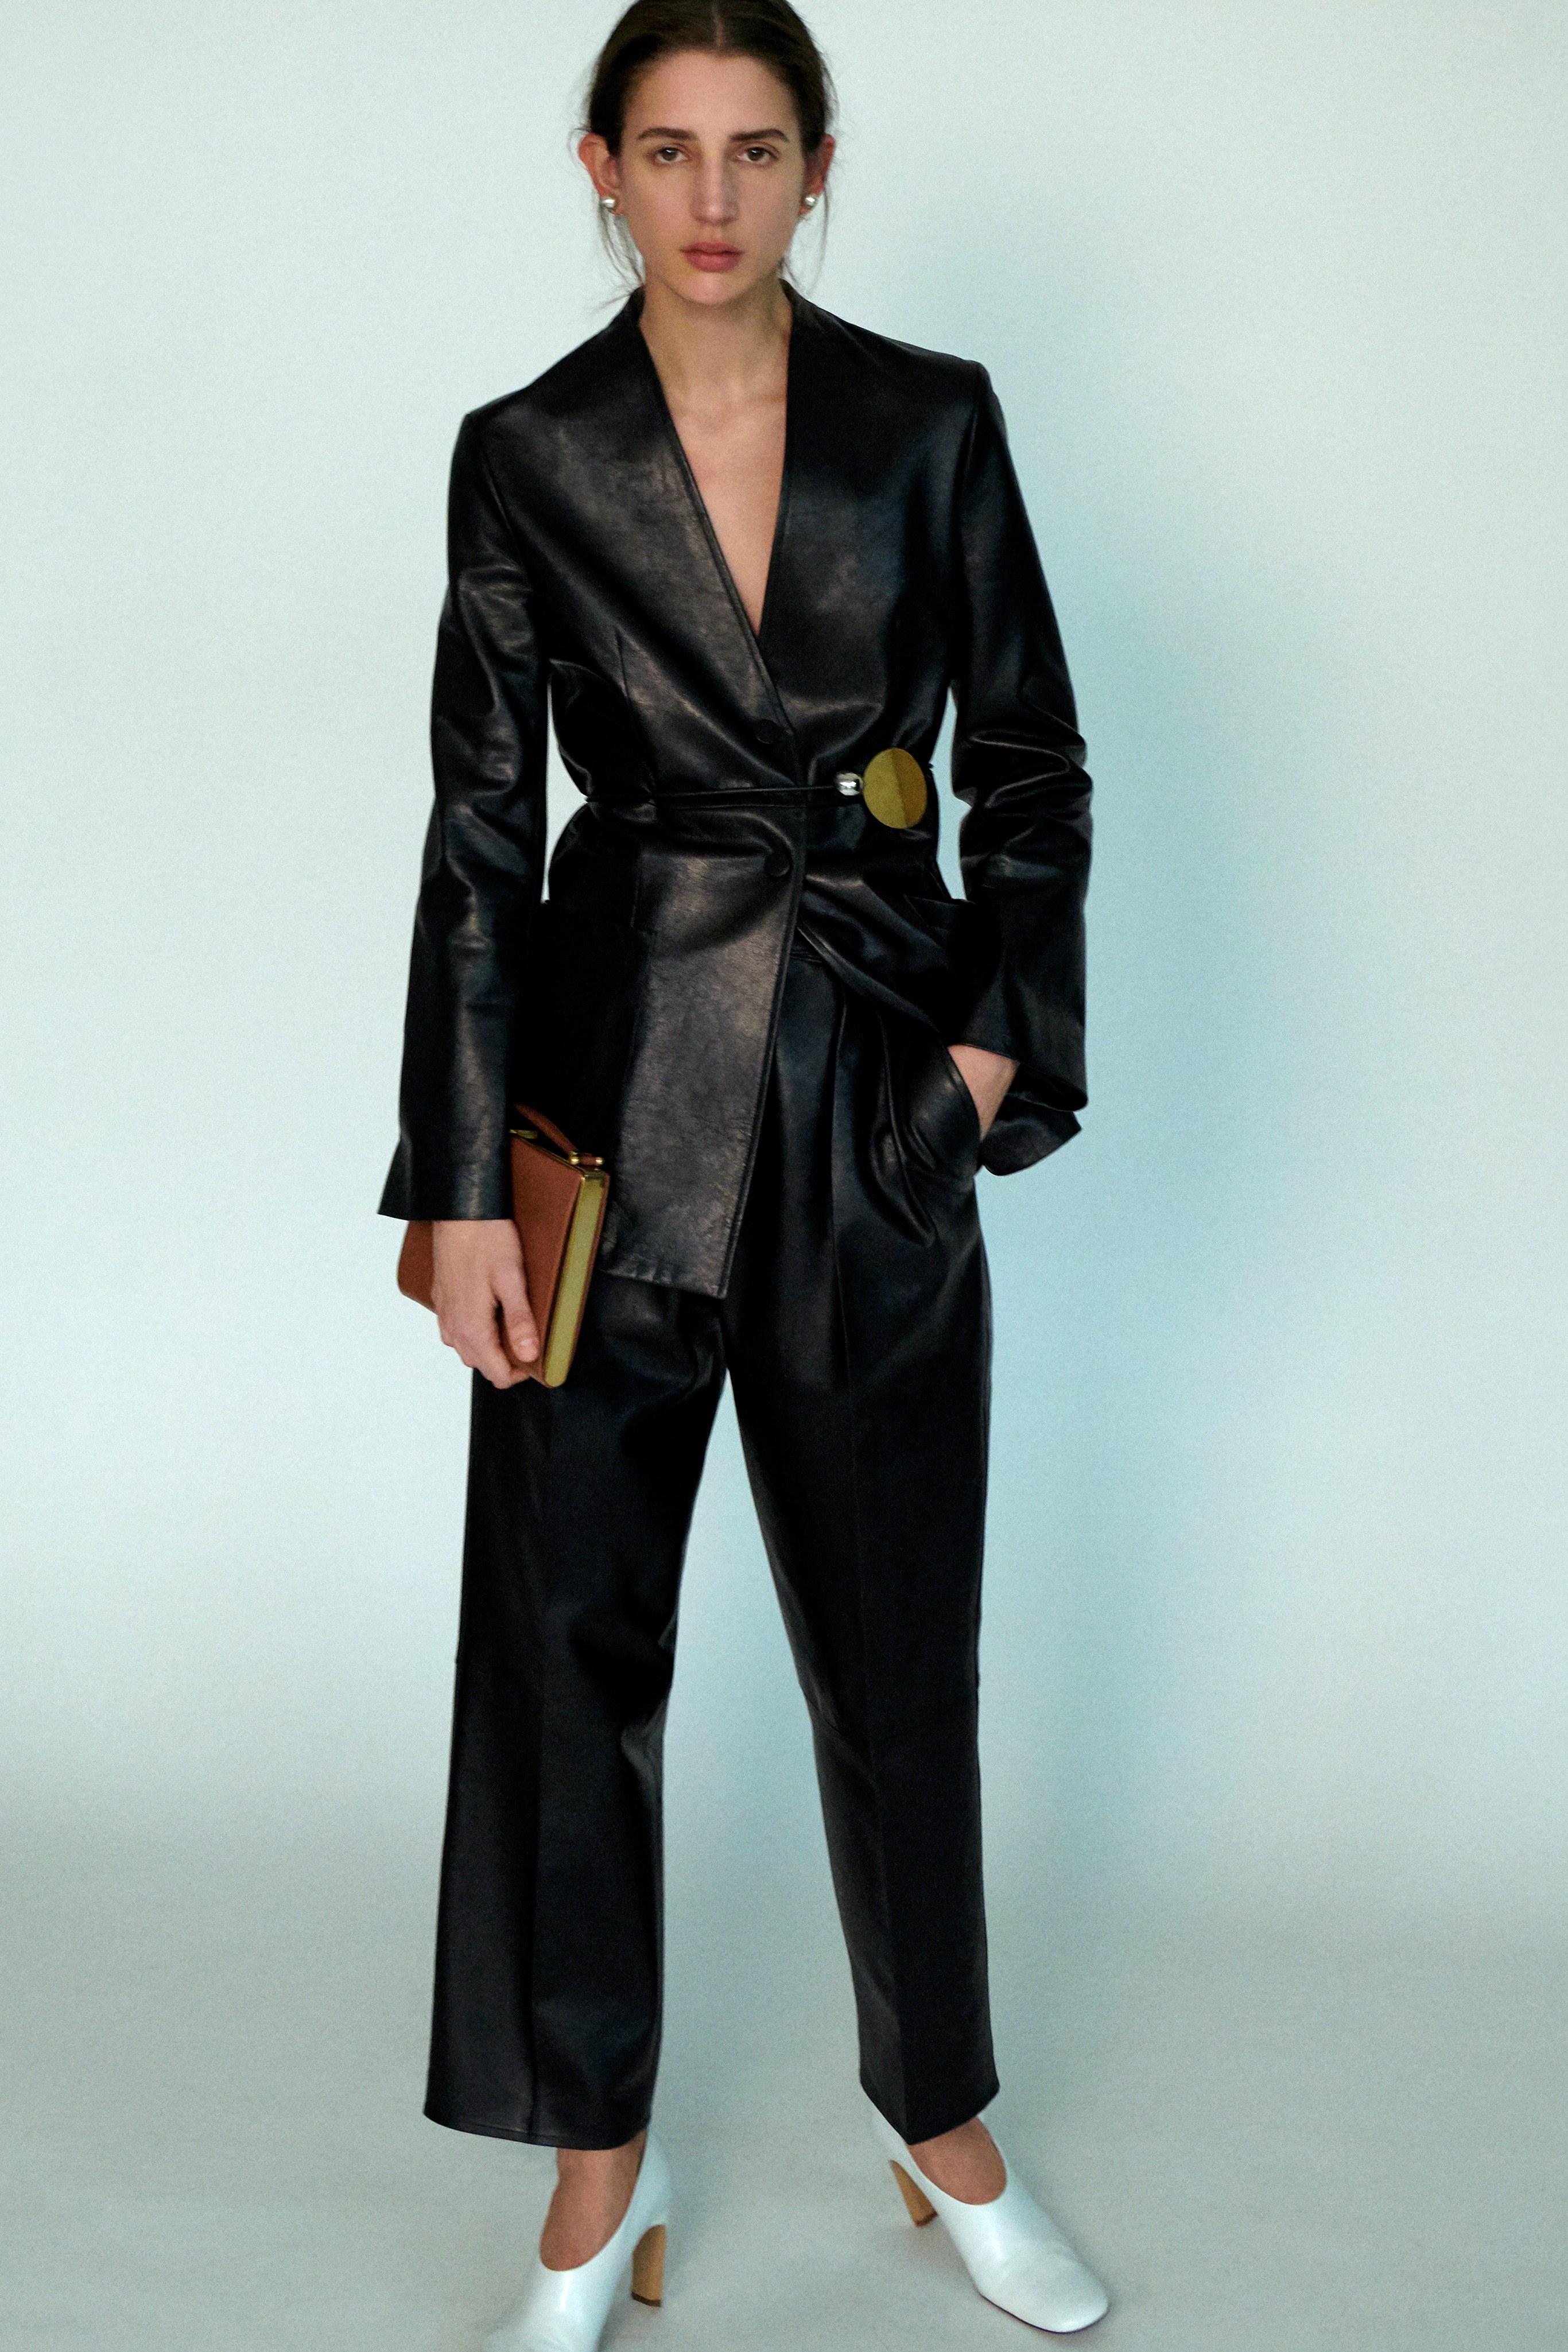 Савхин пиджак, макси юбка болон бусад дурсамж сэргээсэн 2020 оны ретро трендүүд (фото 3)